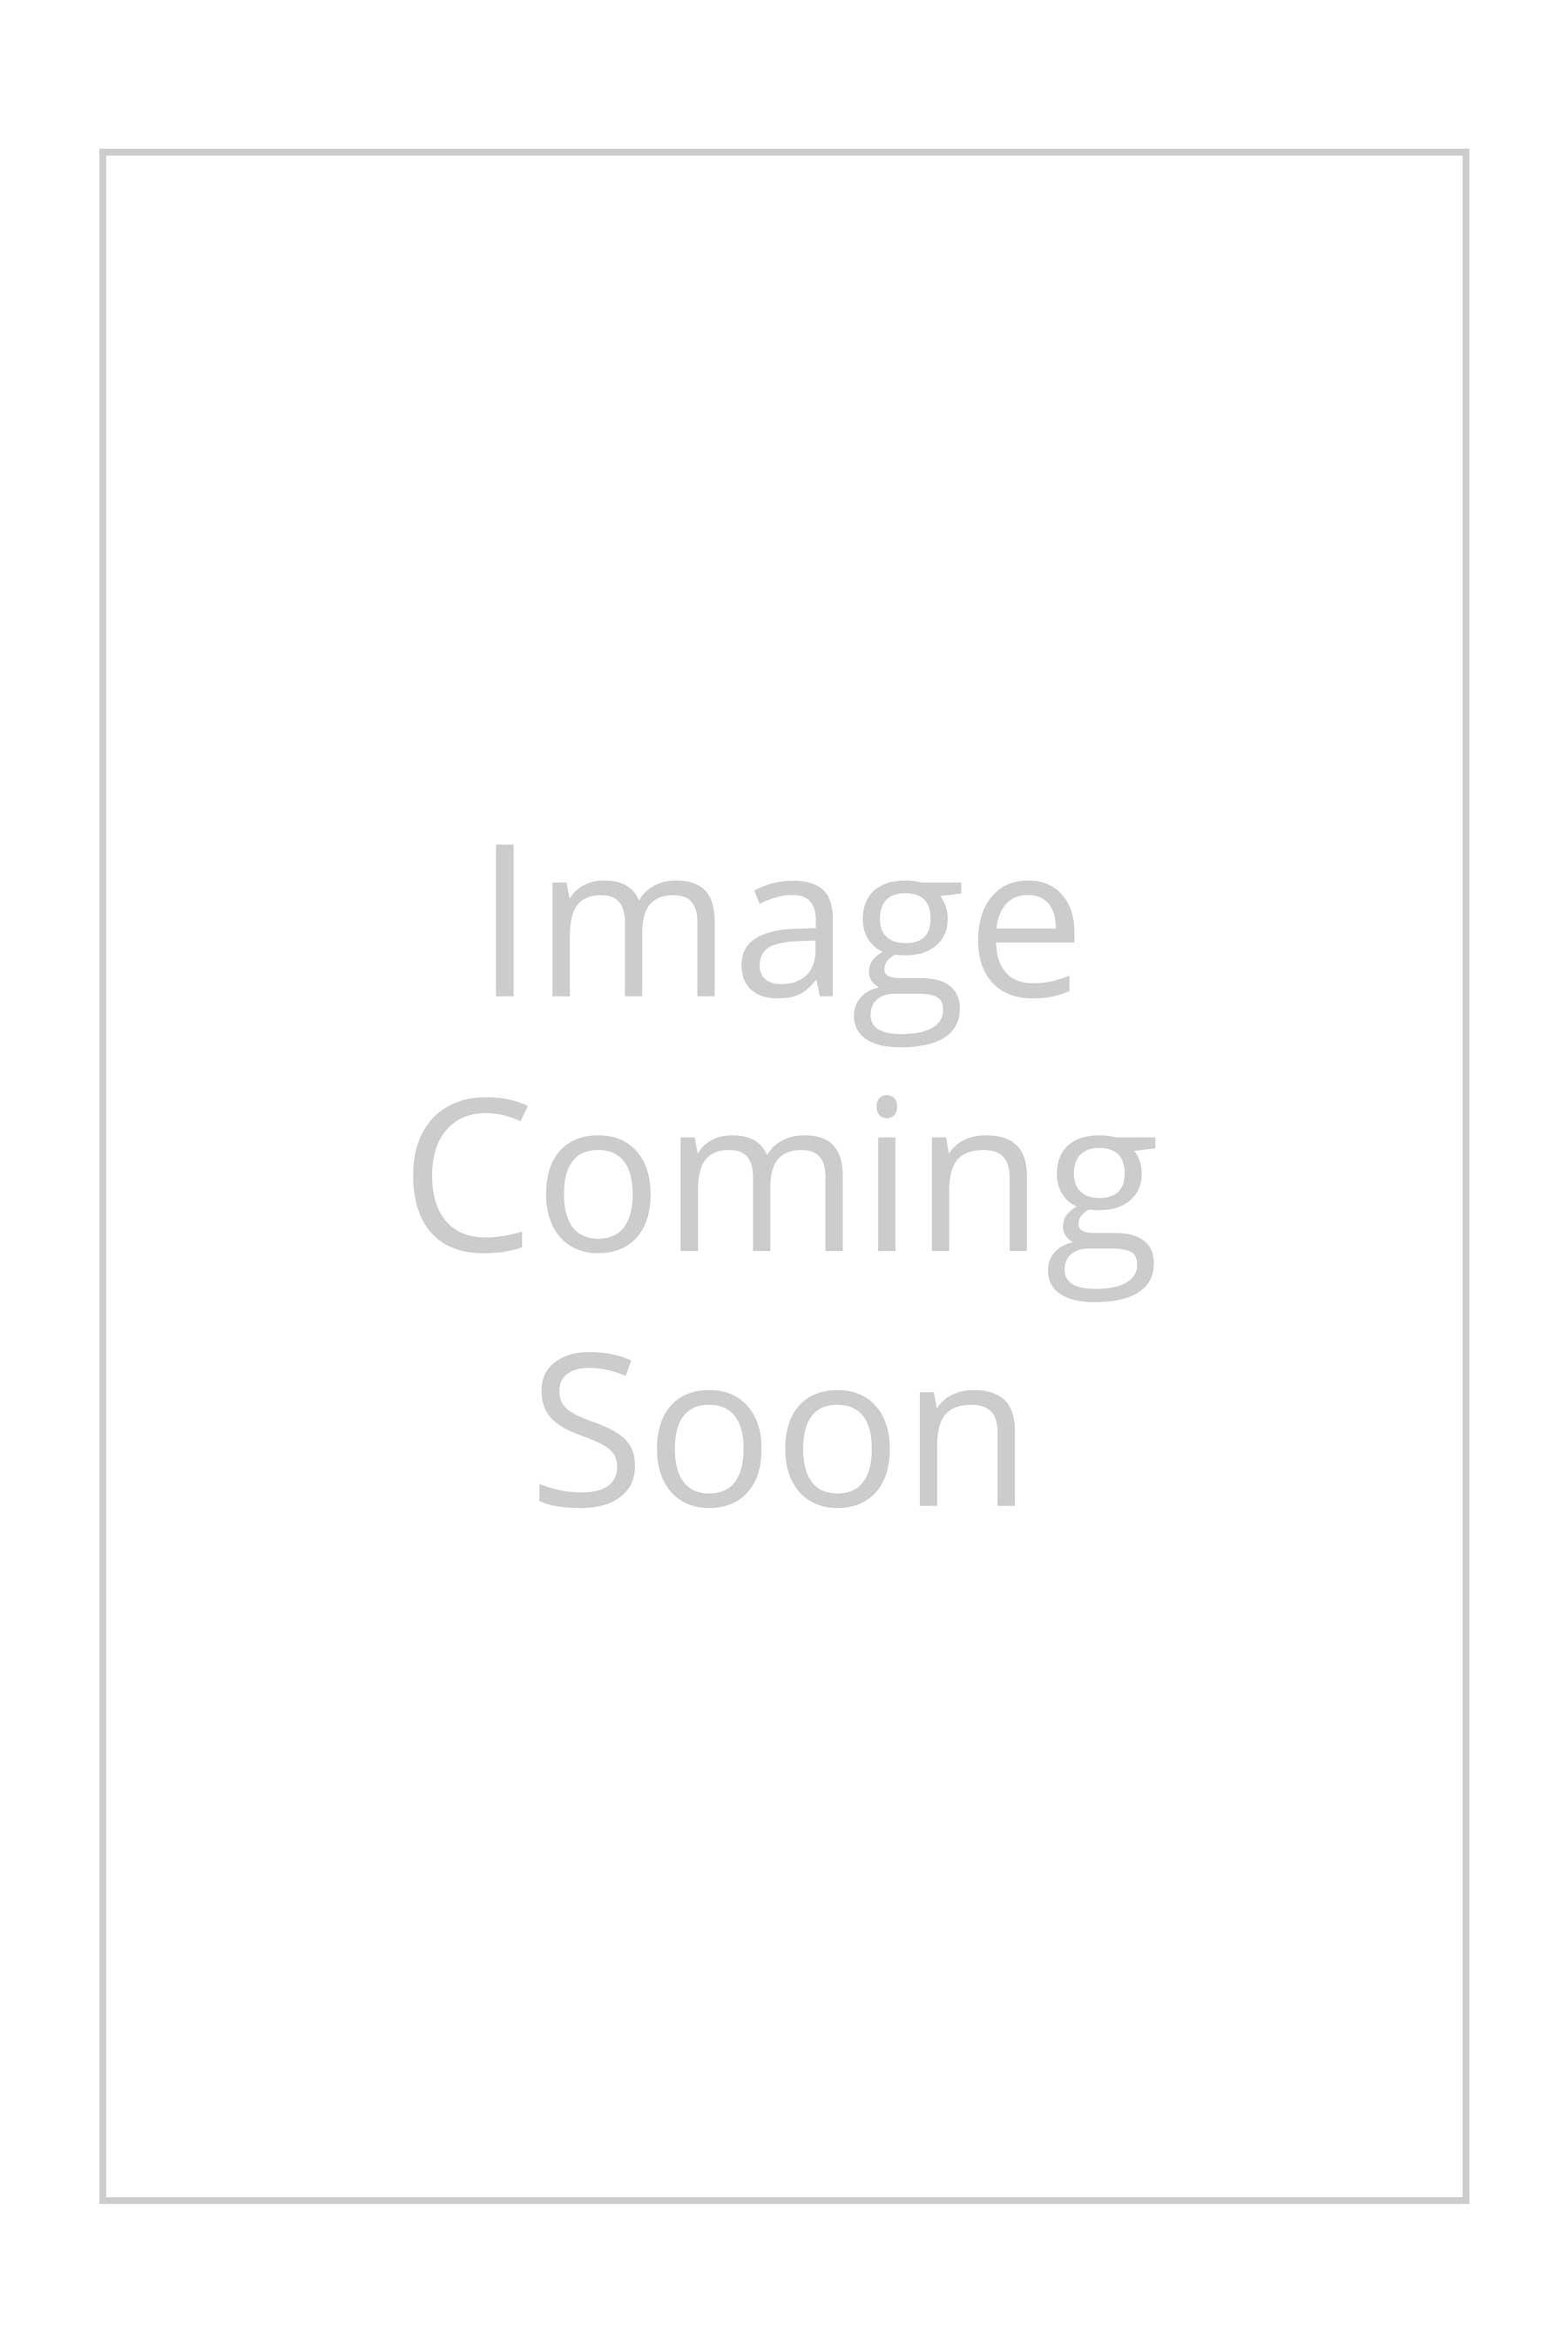 Ralph Lauren Black Label Suede Fit & Flare Skirt in Black